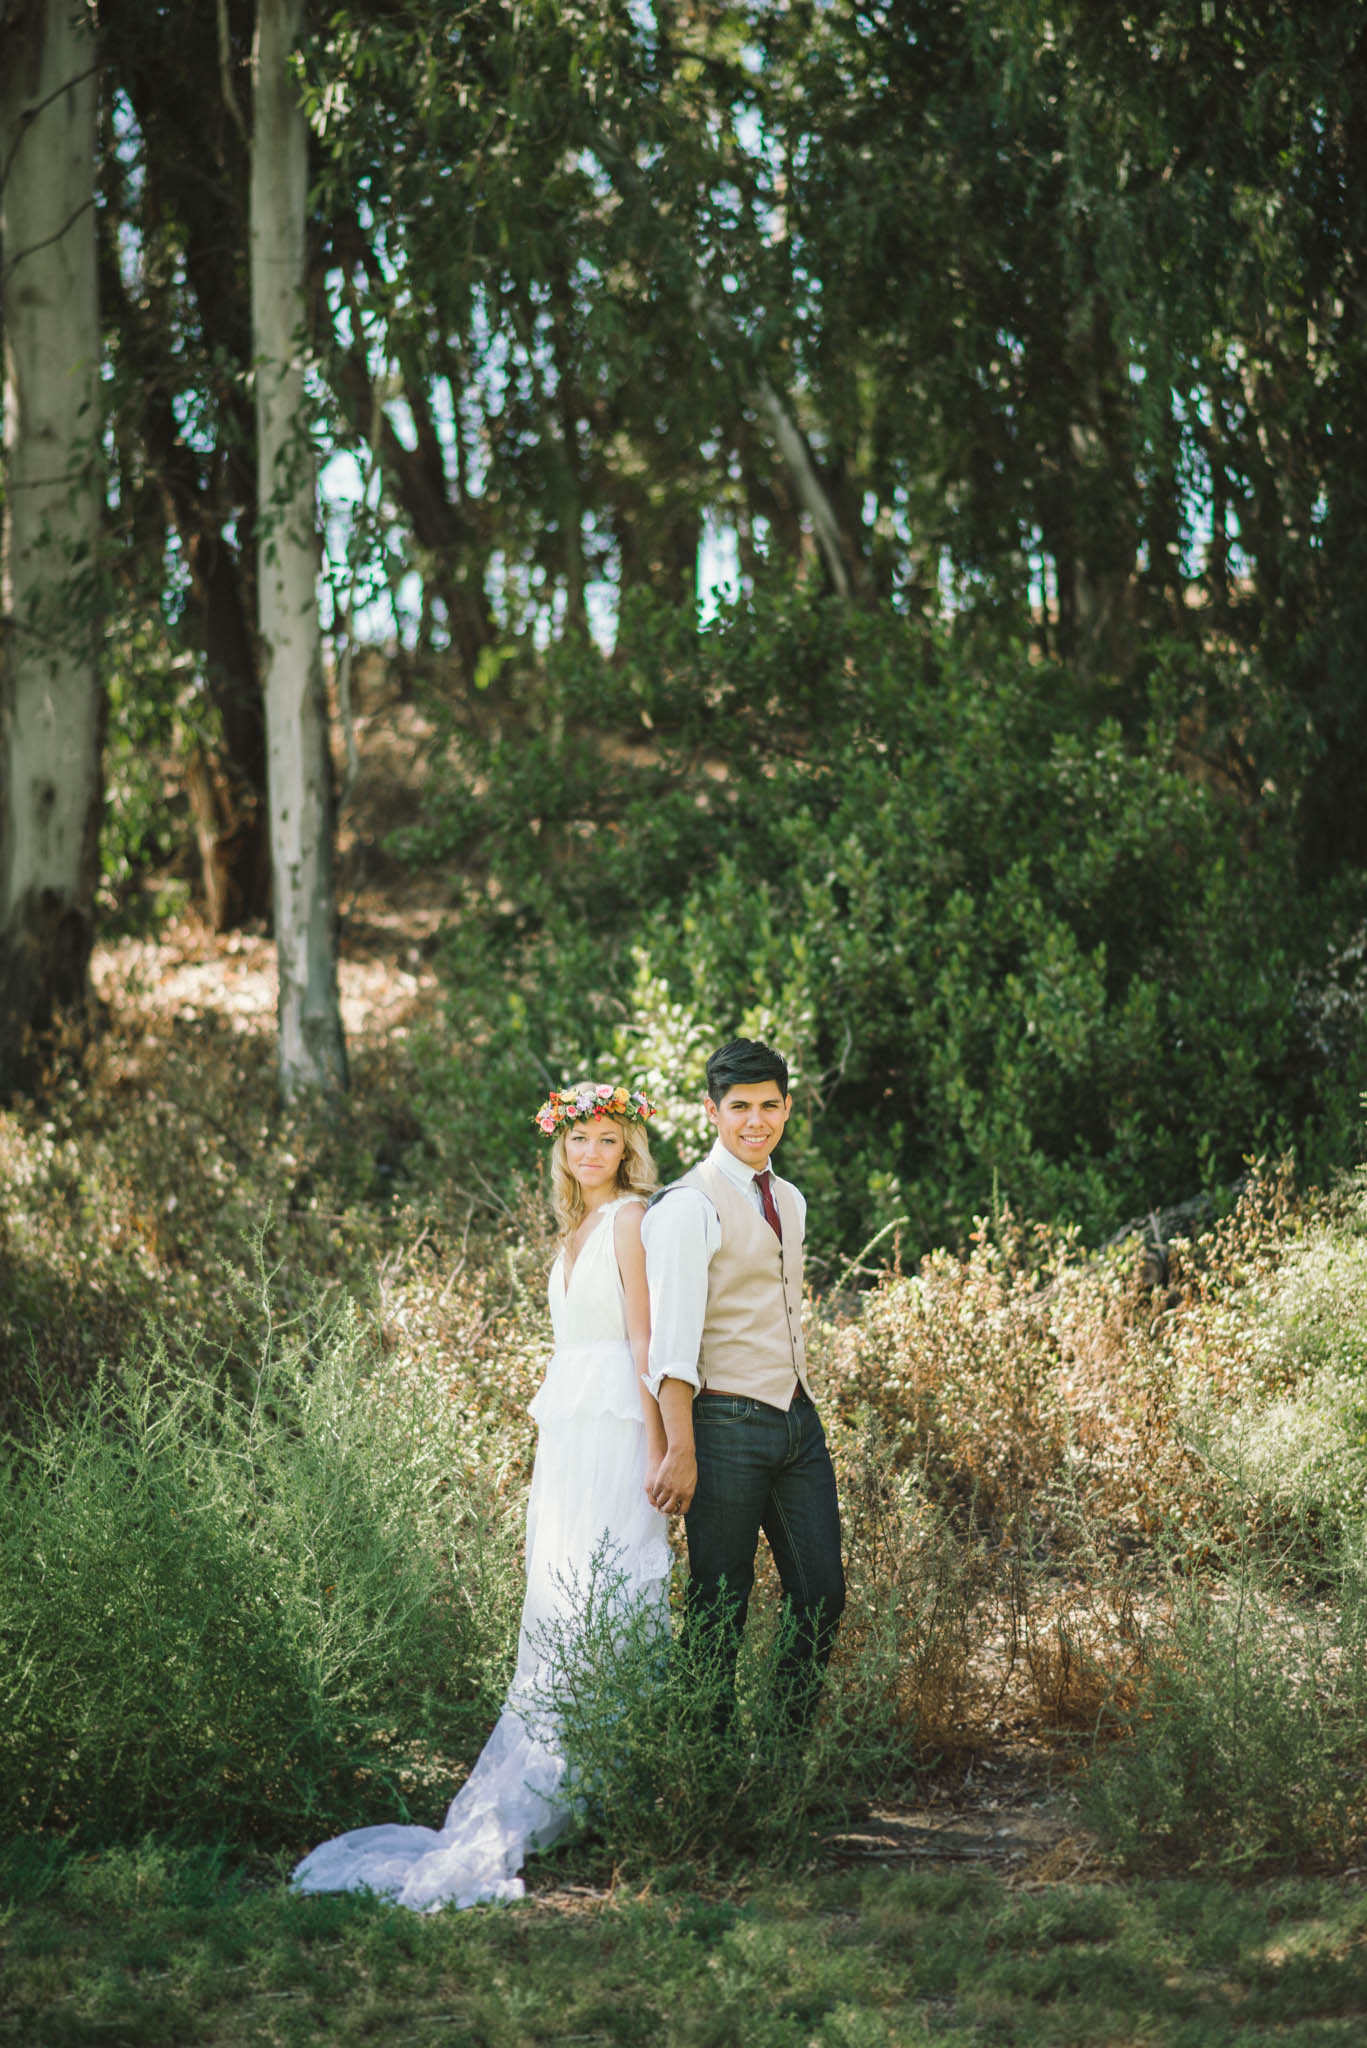 ©Isaiah & Taylor Photography - Los Angeles Wedding Photographer - Mexican Bohemian Wedding, Laguna Niguel Regional Park, Orange County-20.jpg